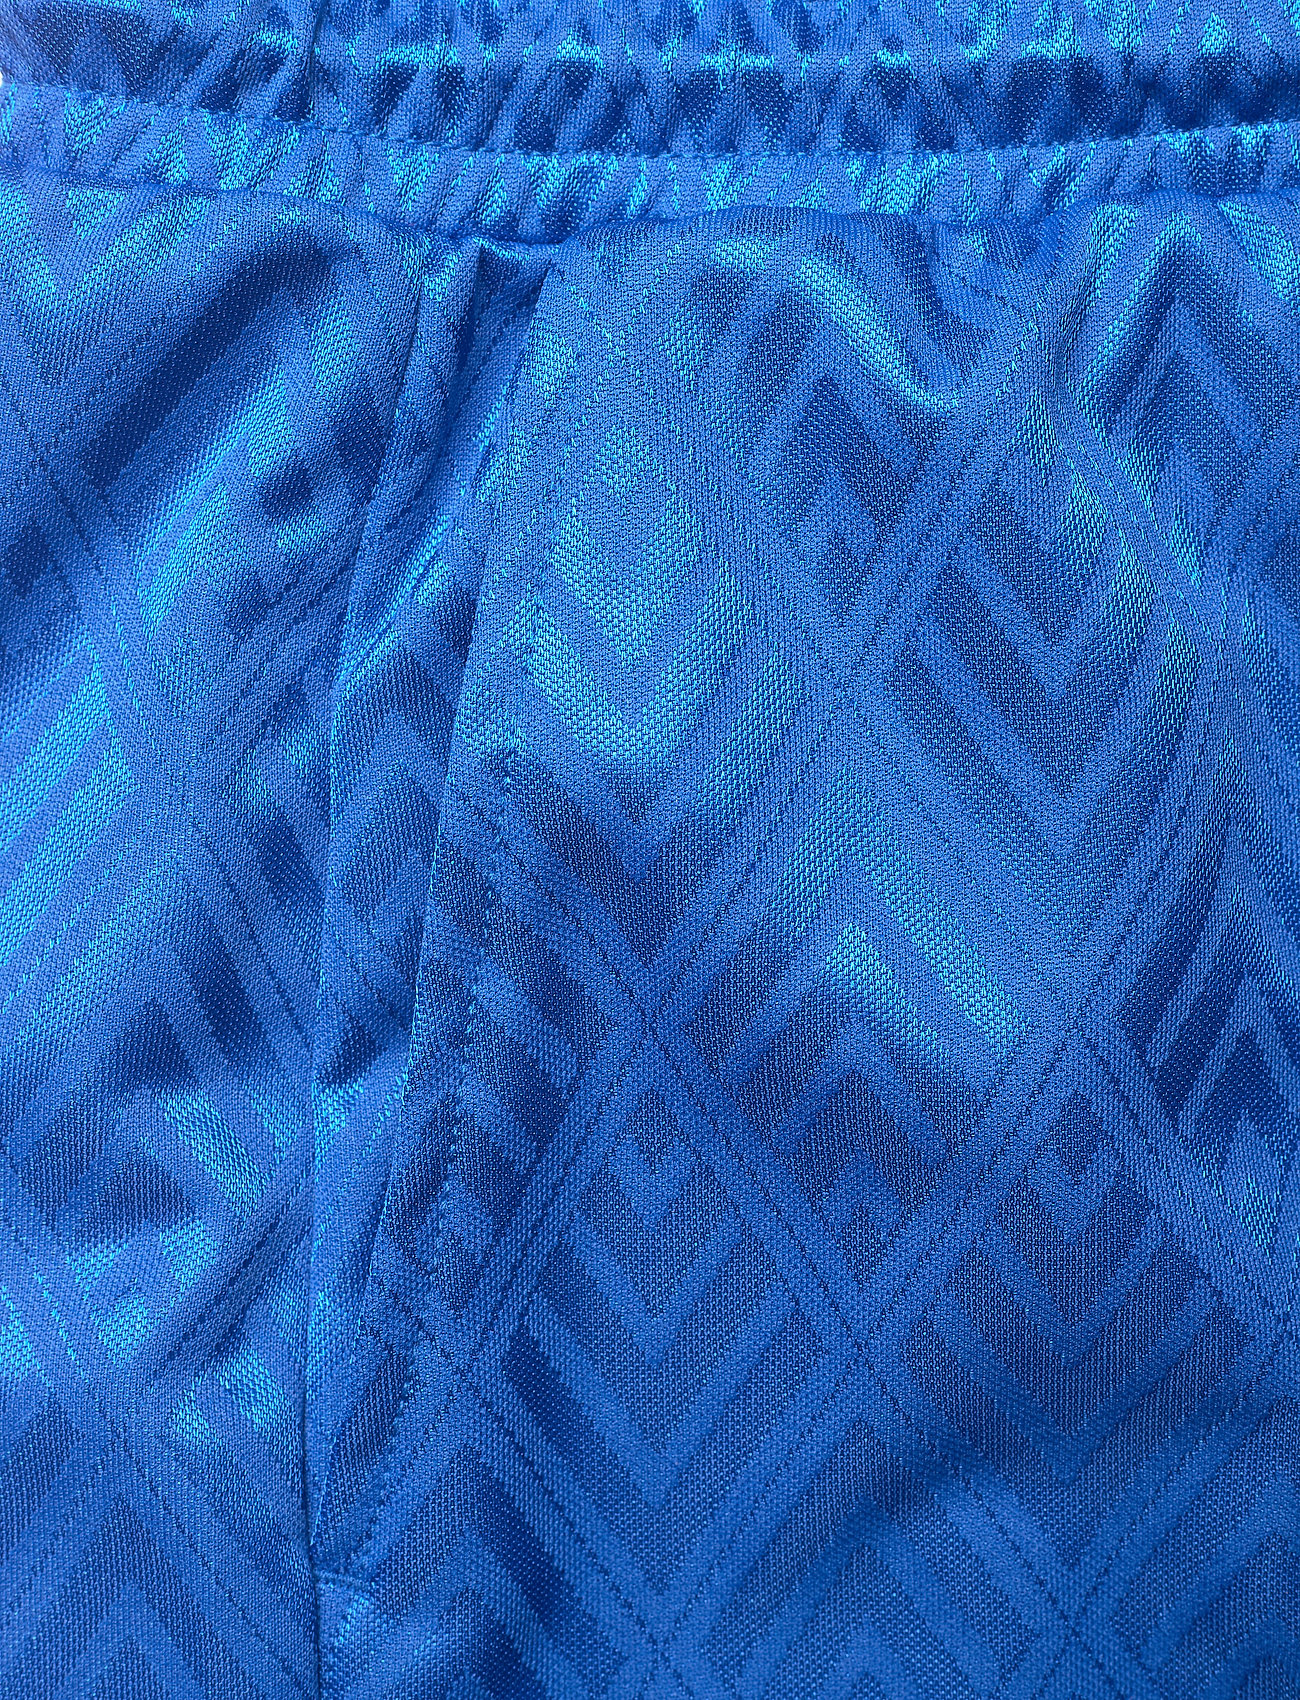 HAN Kjøbenhavn - Football Shorts - casual shorts - bright blue - 2